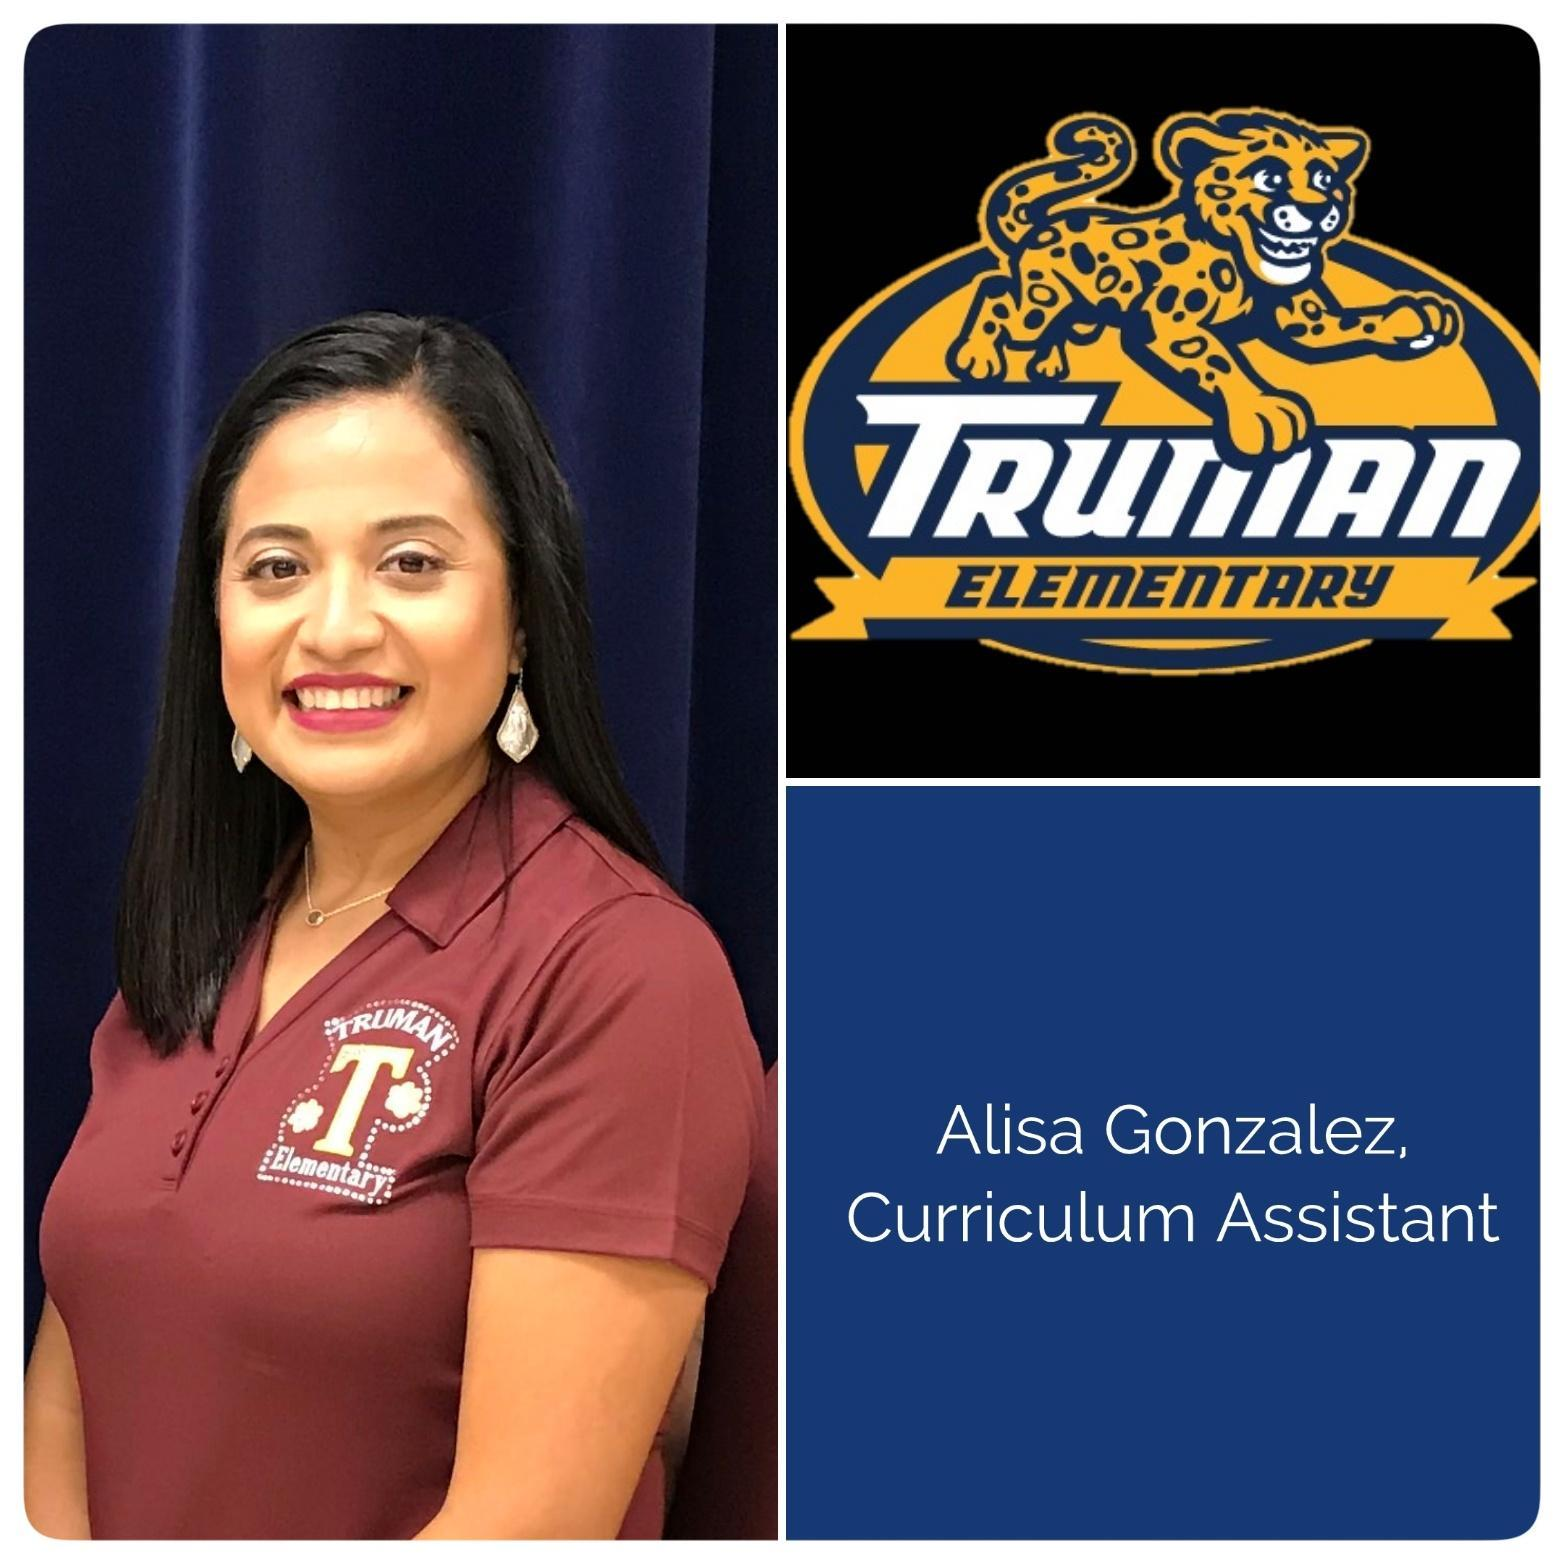 Curriculum Assistant, Alisa Gonzalez